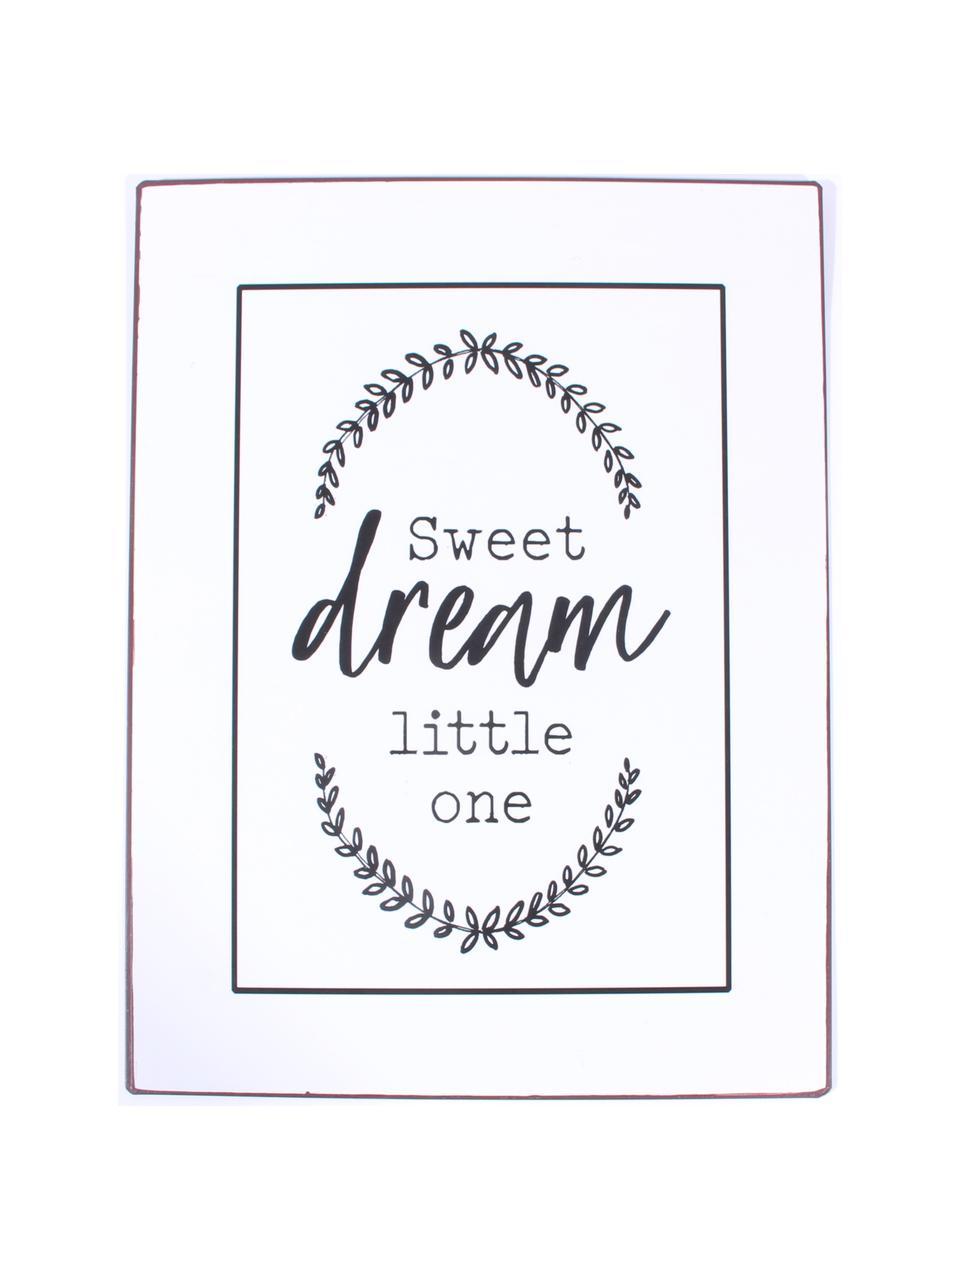 Wandschild Sweet dream little one, Metall, beschichtet, Weiß, Schwarz, 27 x 35 cm